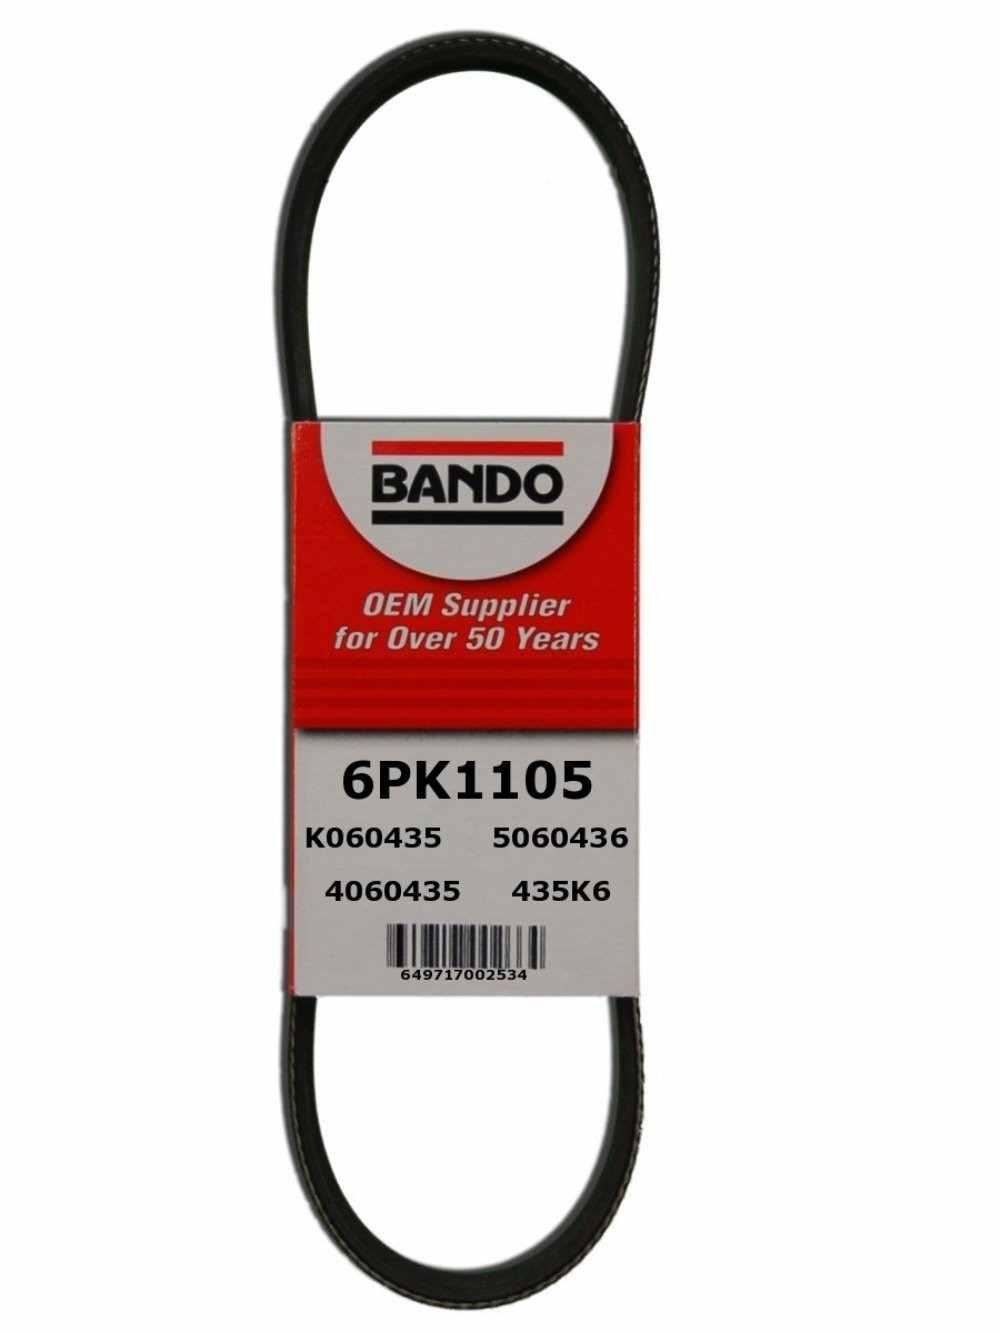 BANDO - Rib Ace Precision Engineered V-Ribbed Belt (Compressor) - BWO 6PK1105